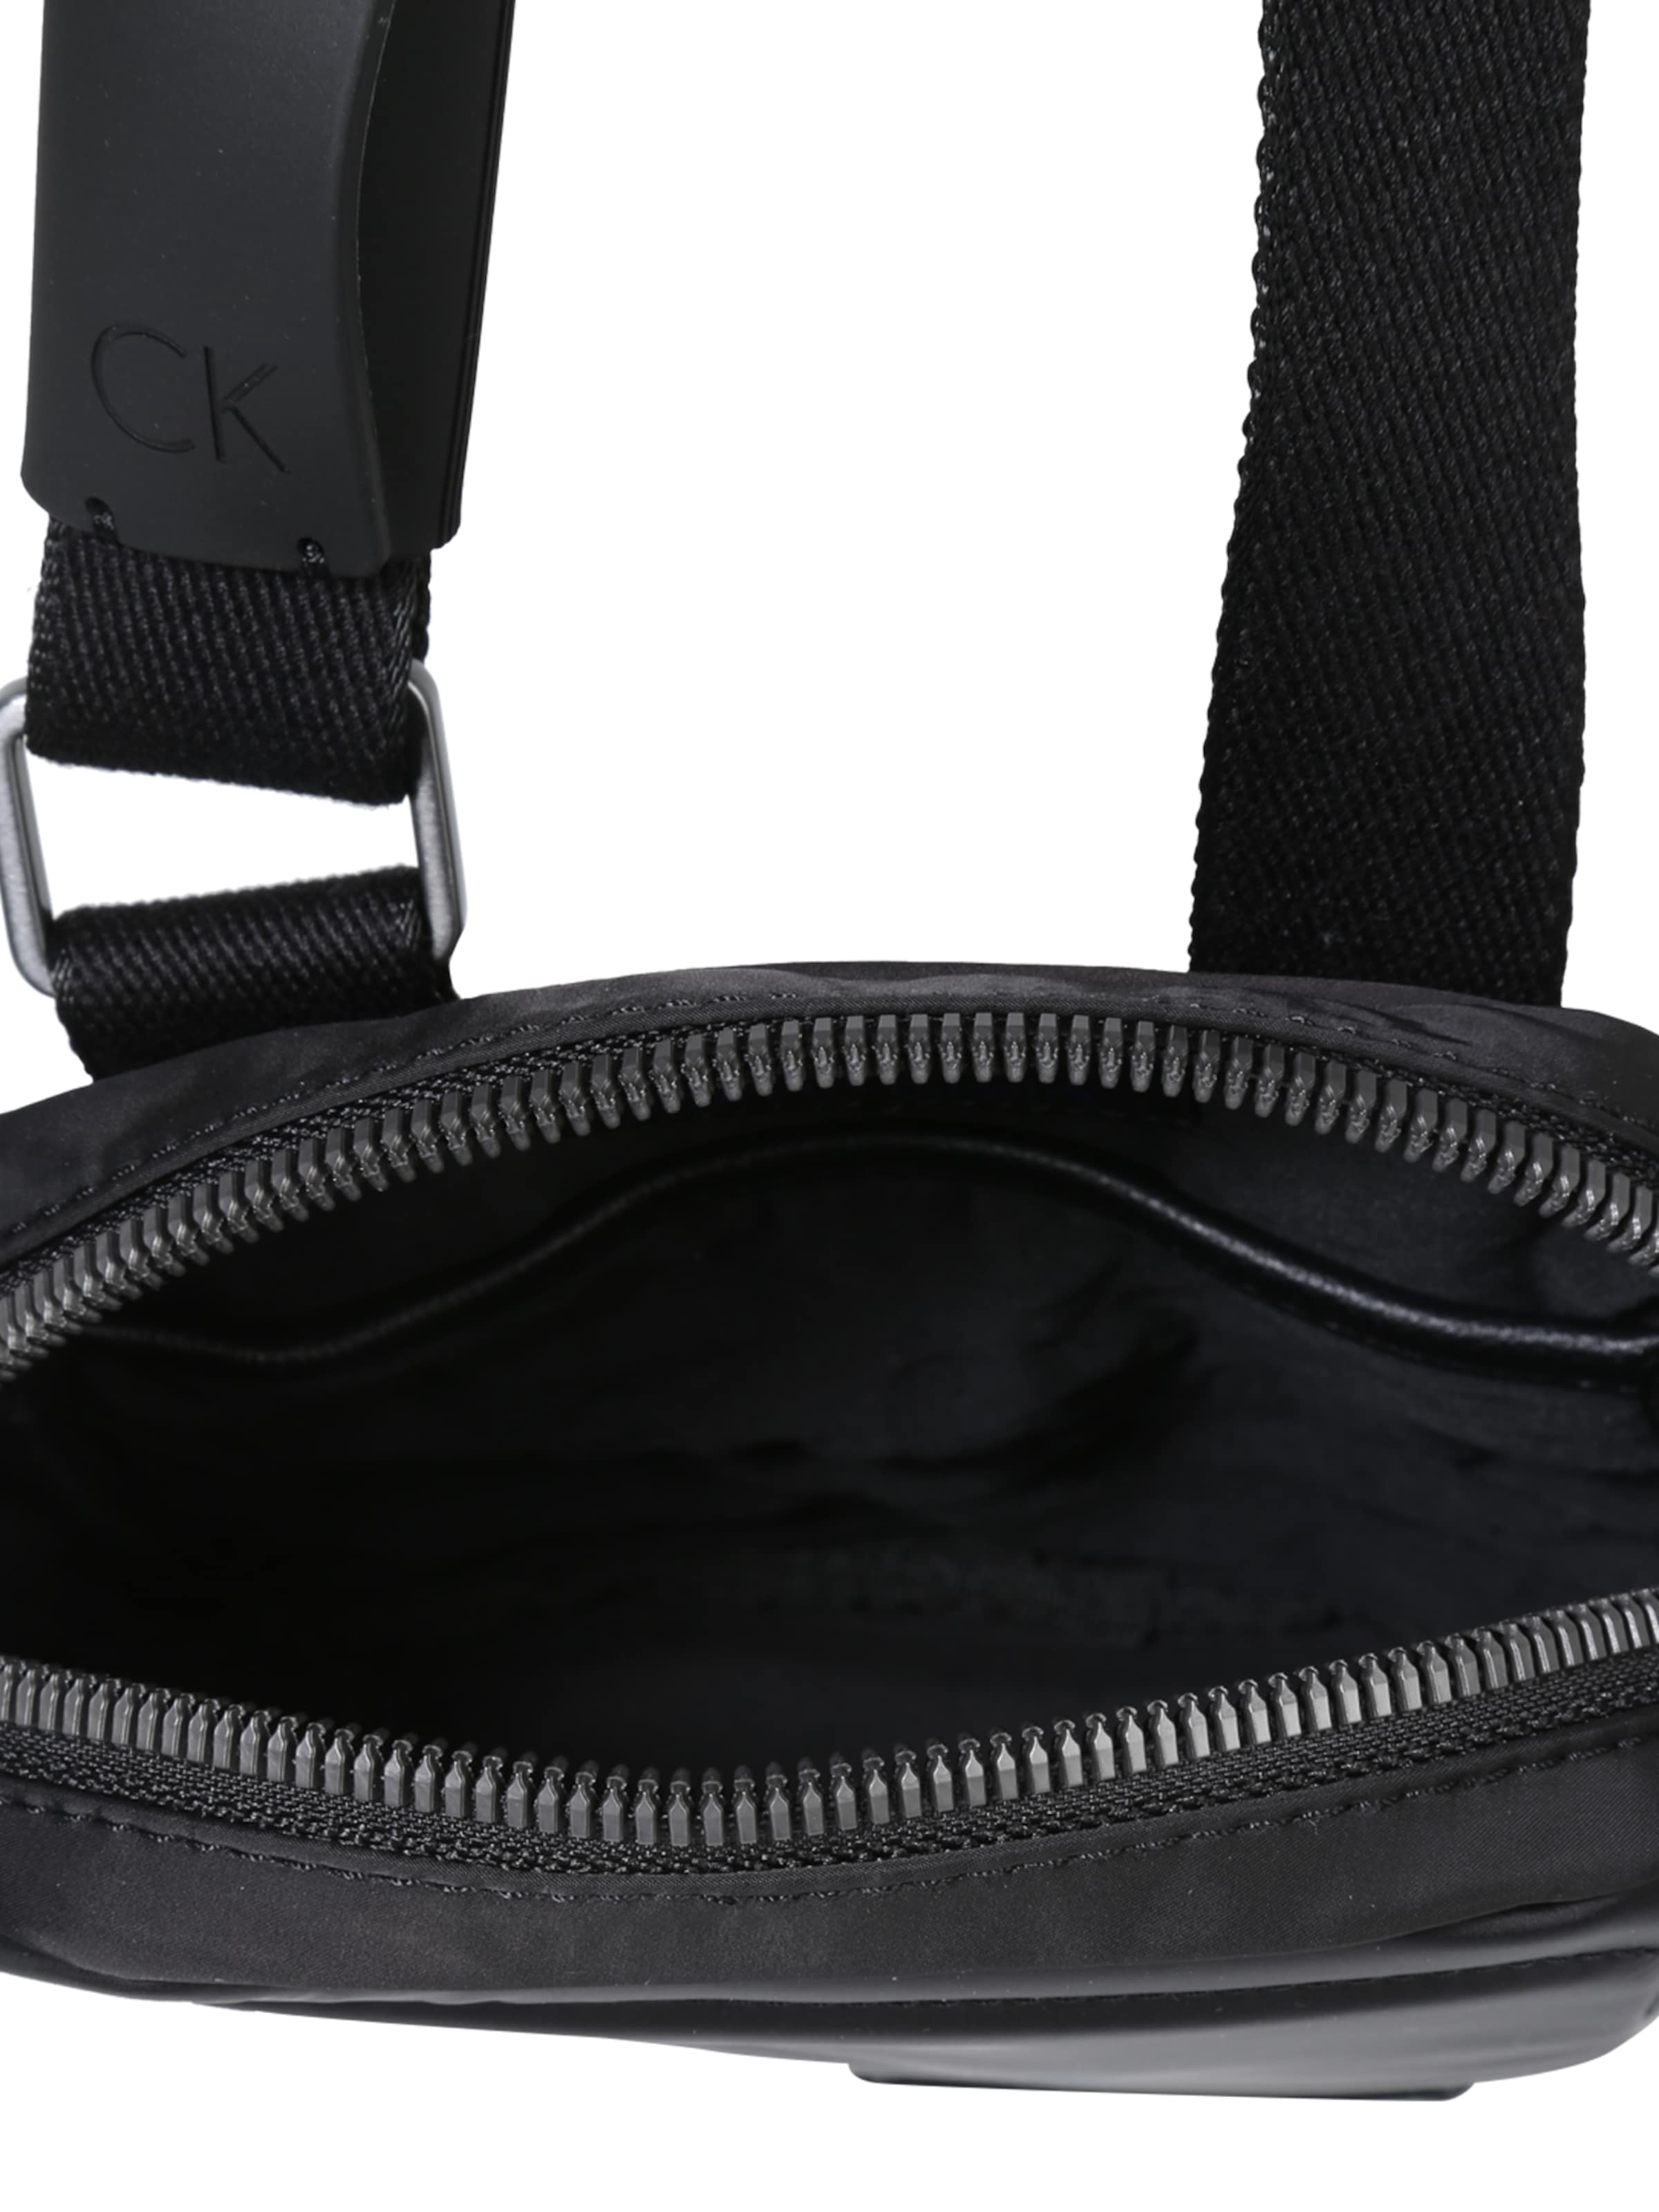 Billig Verkauf Kauf Calvin Klein Umhängetasche 'TECH NYLON MINI REPORTER' Rabatt 2018 Unisex KKR66sS9